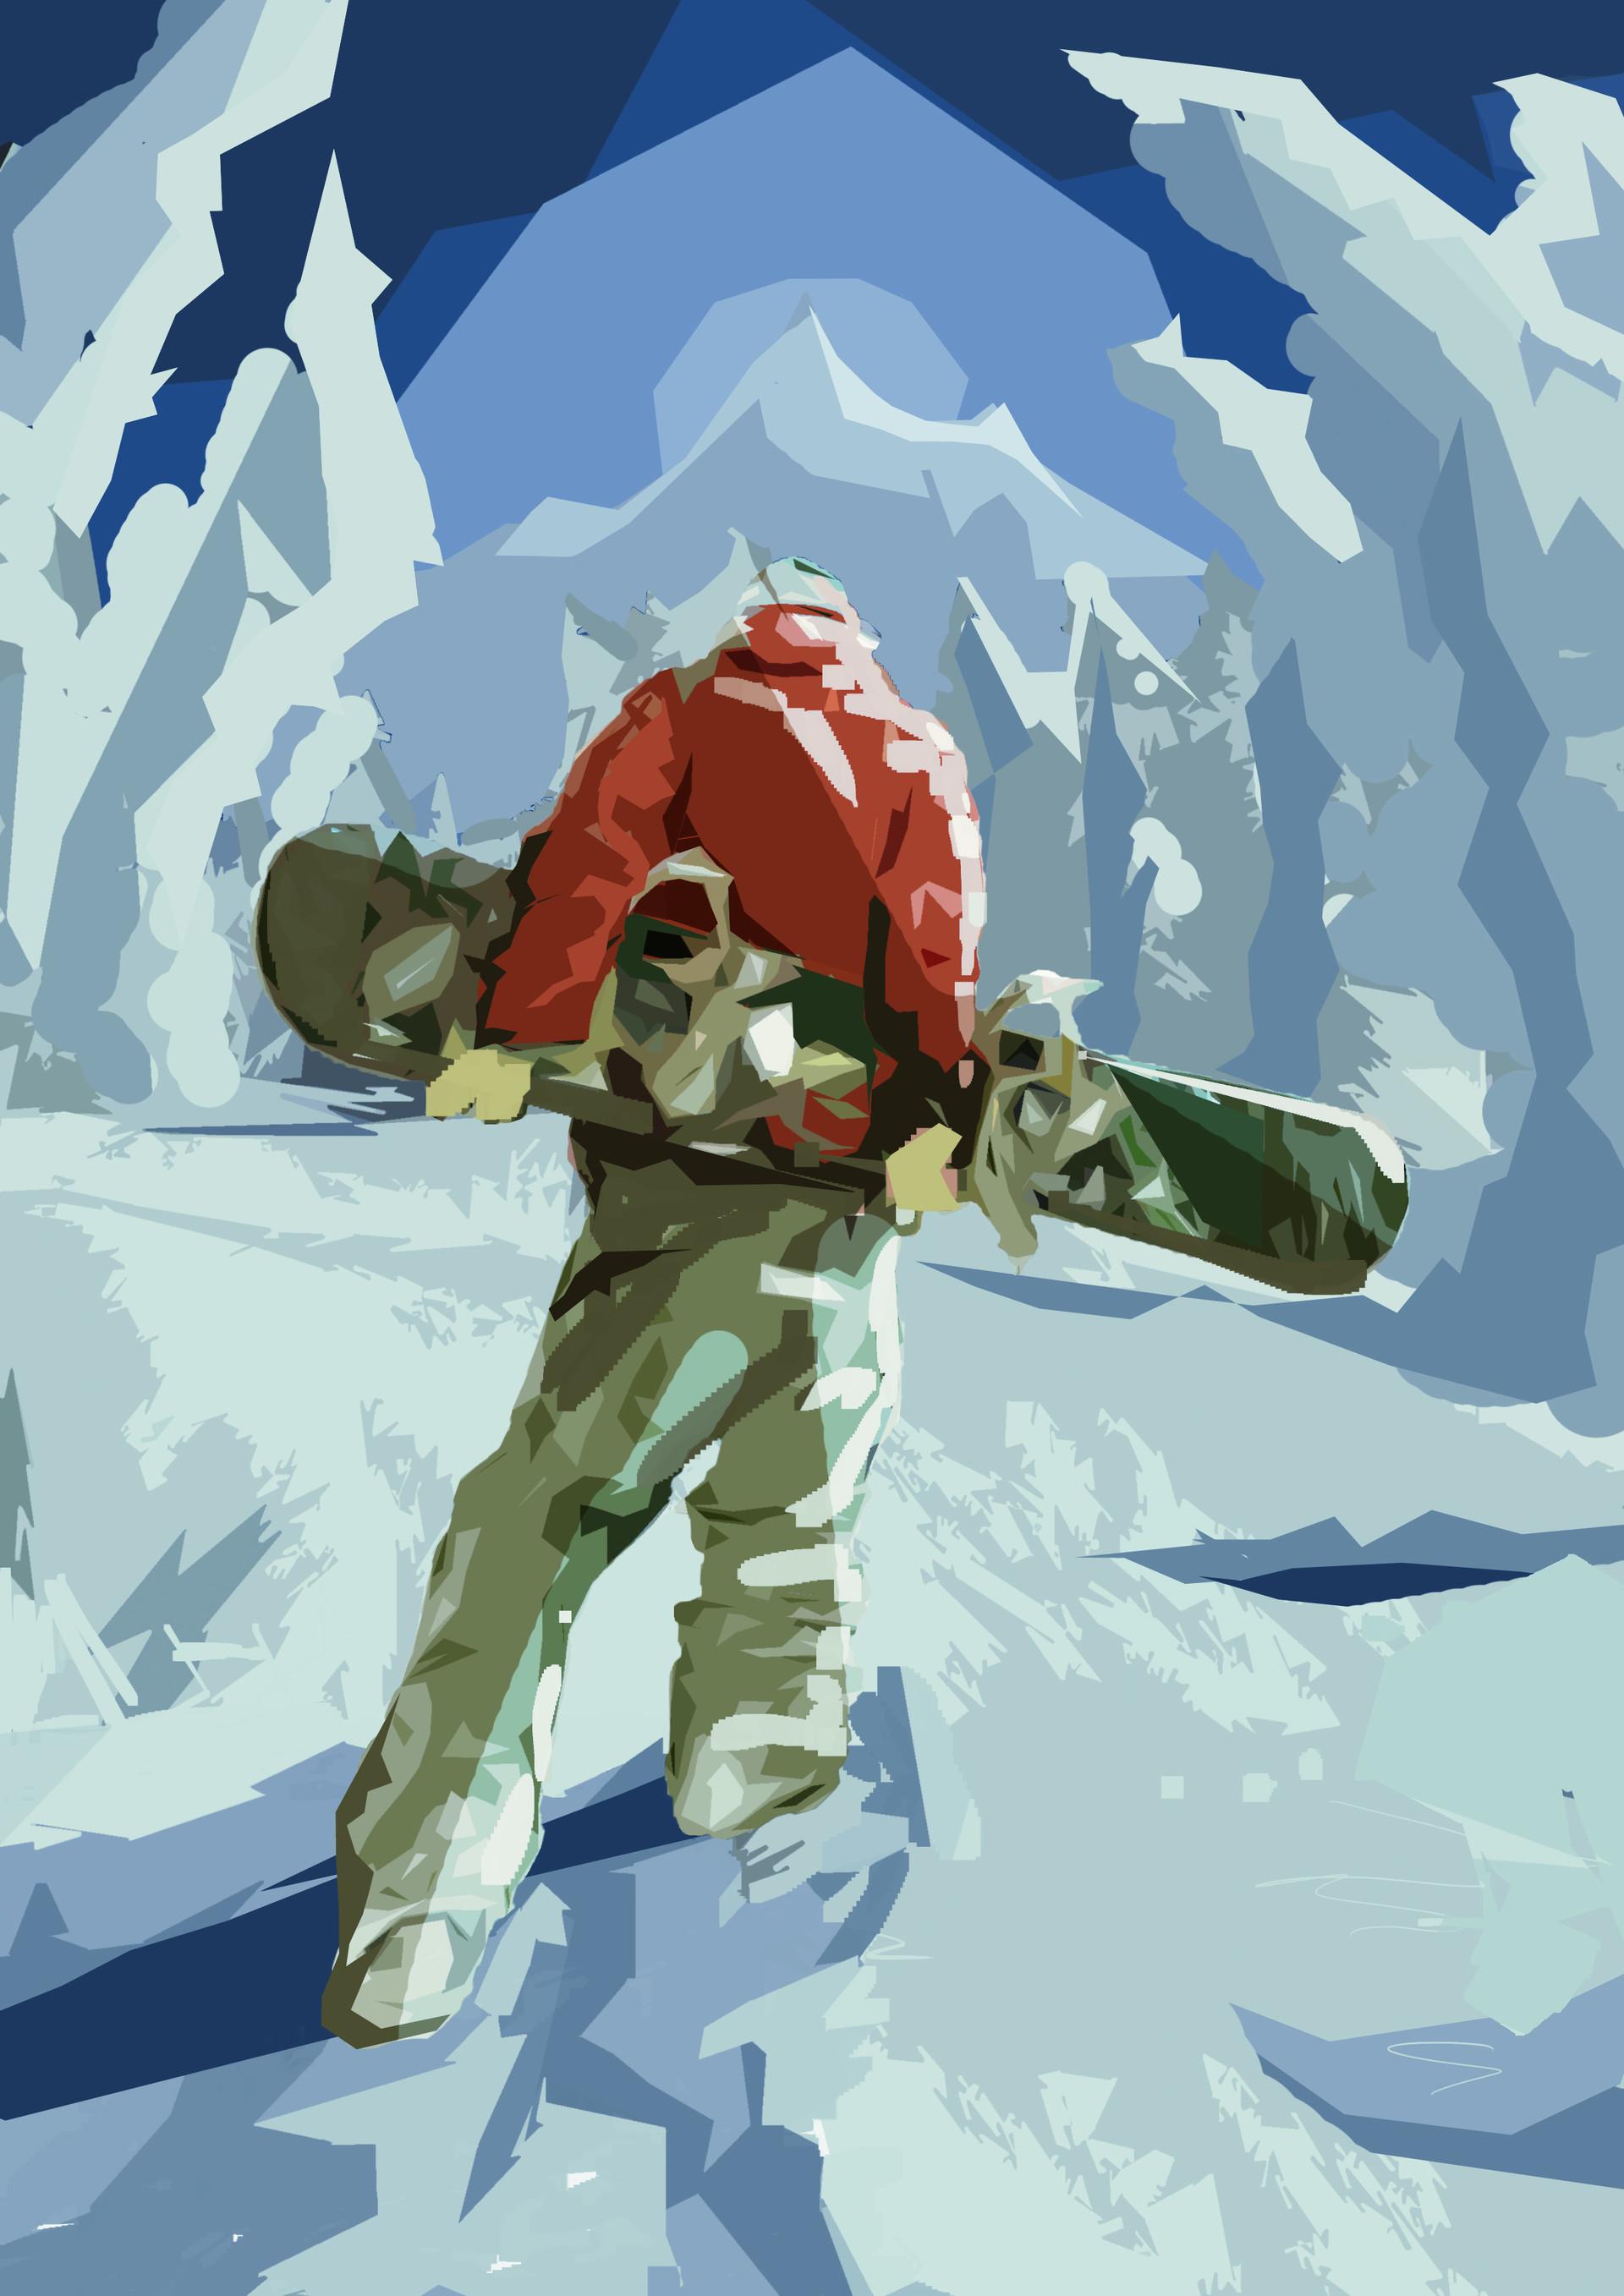 Andre mueller 20141216 snowboarder